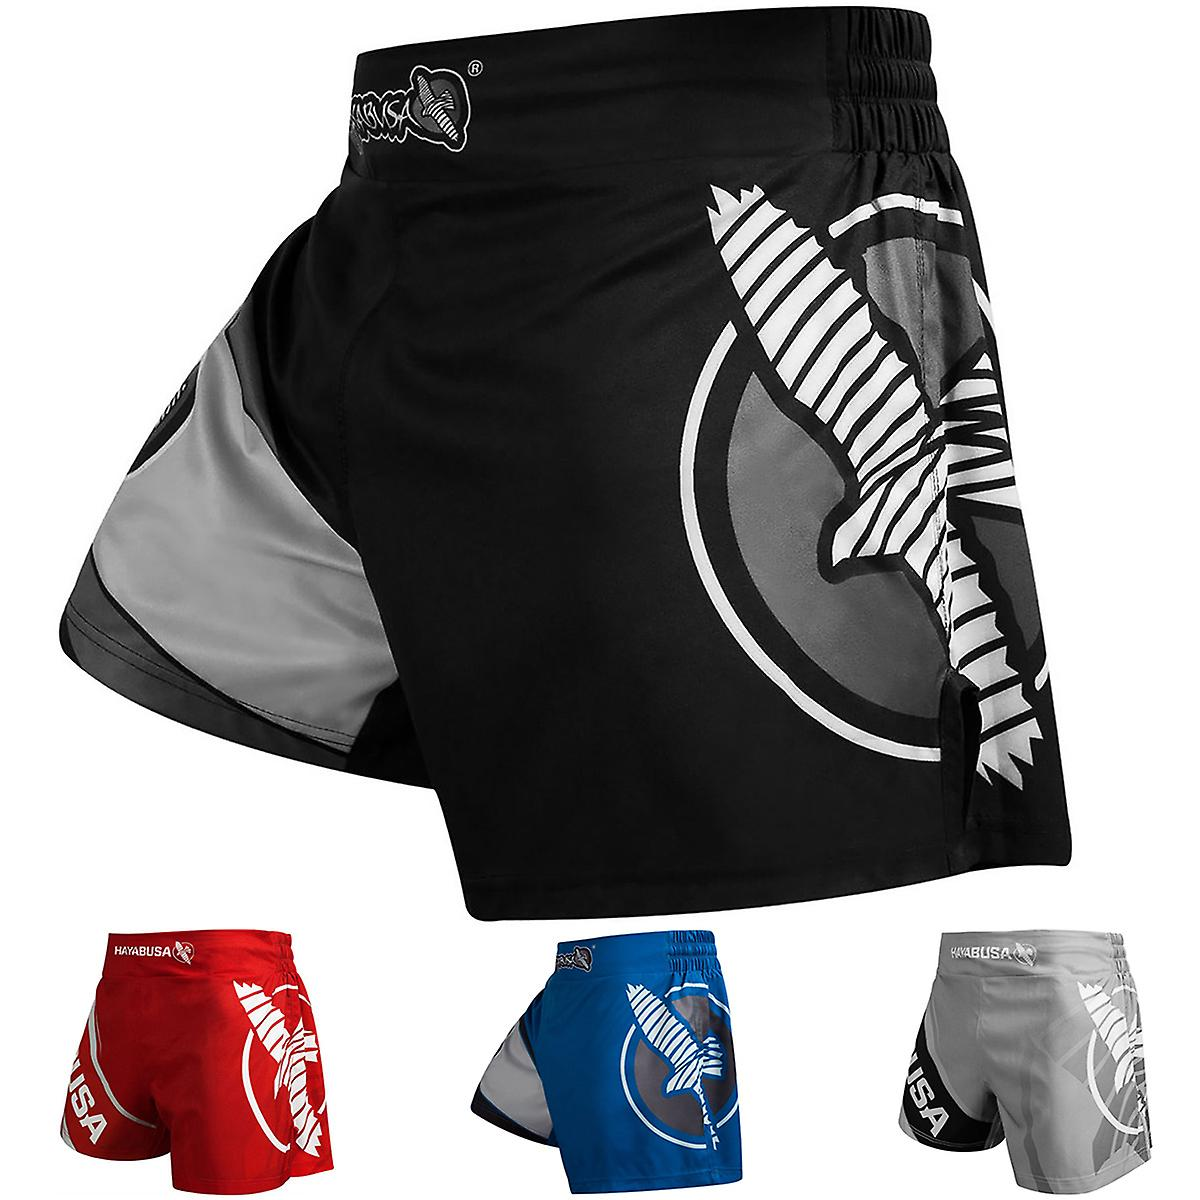 Hayabusa Ultra leggero metà coscia Kickboxing Shorts